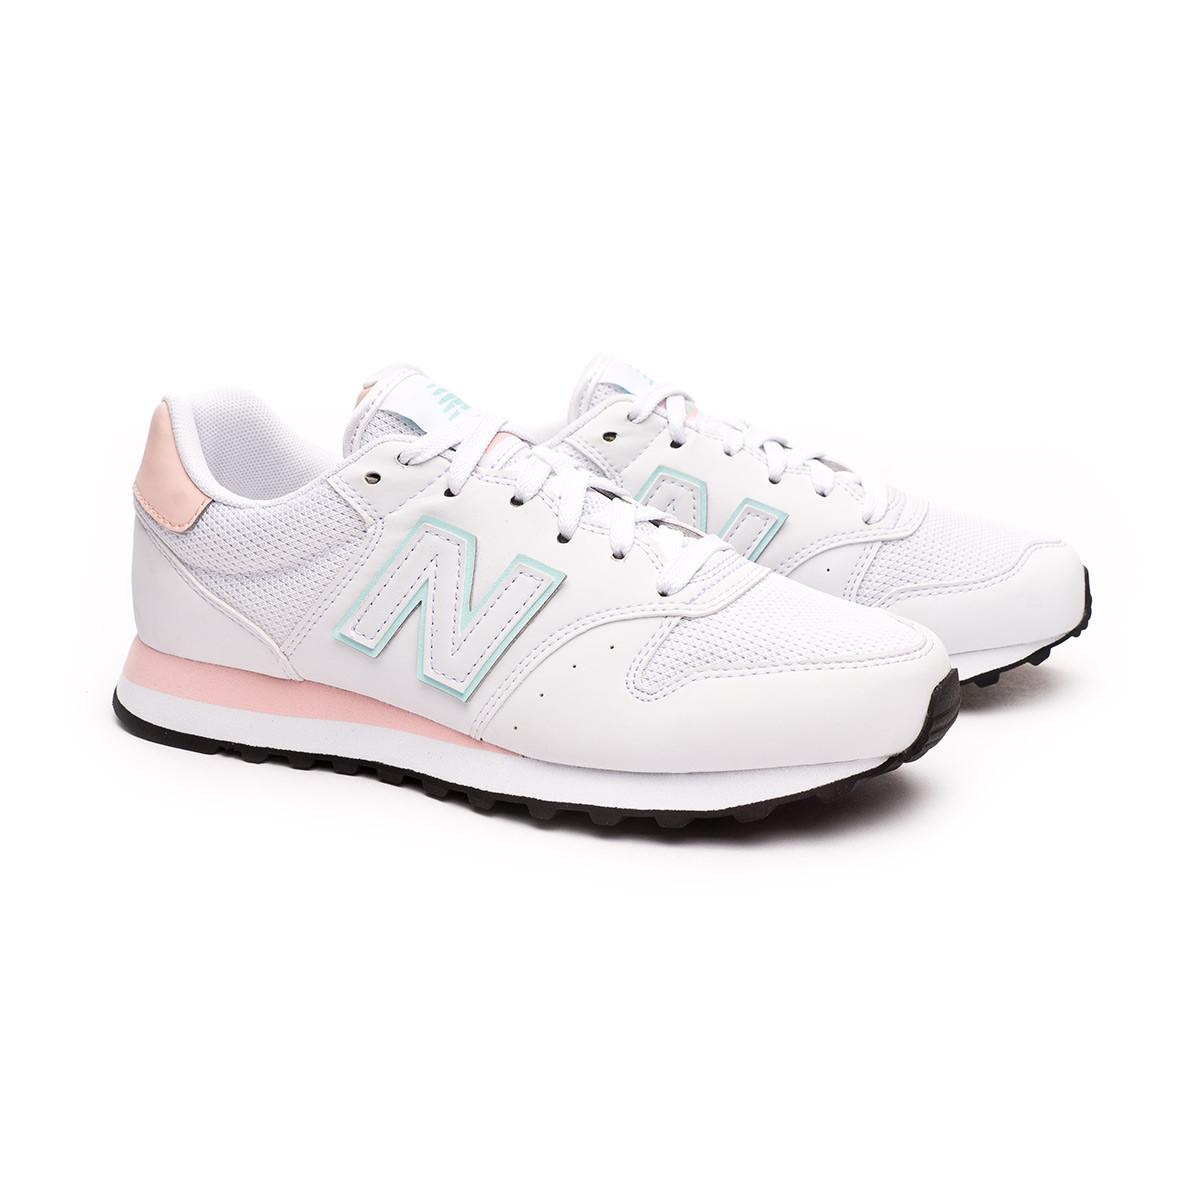 zapatillas new balance blanco